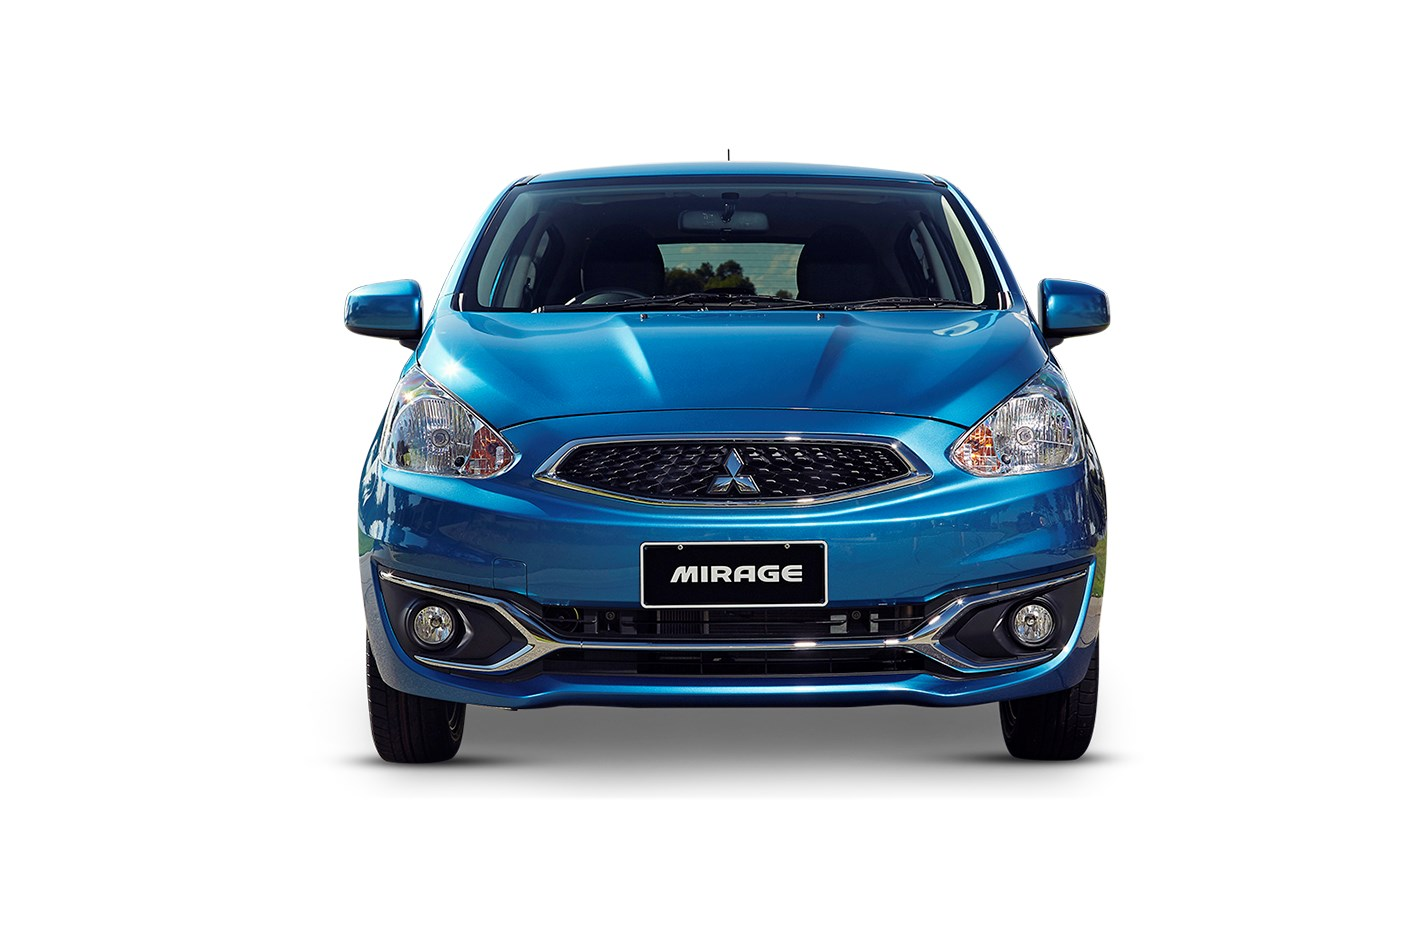 2019 Mitsubishi Mirage ES, 1.2L 3cyl Petrol Manual, Hatchback